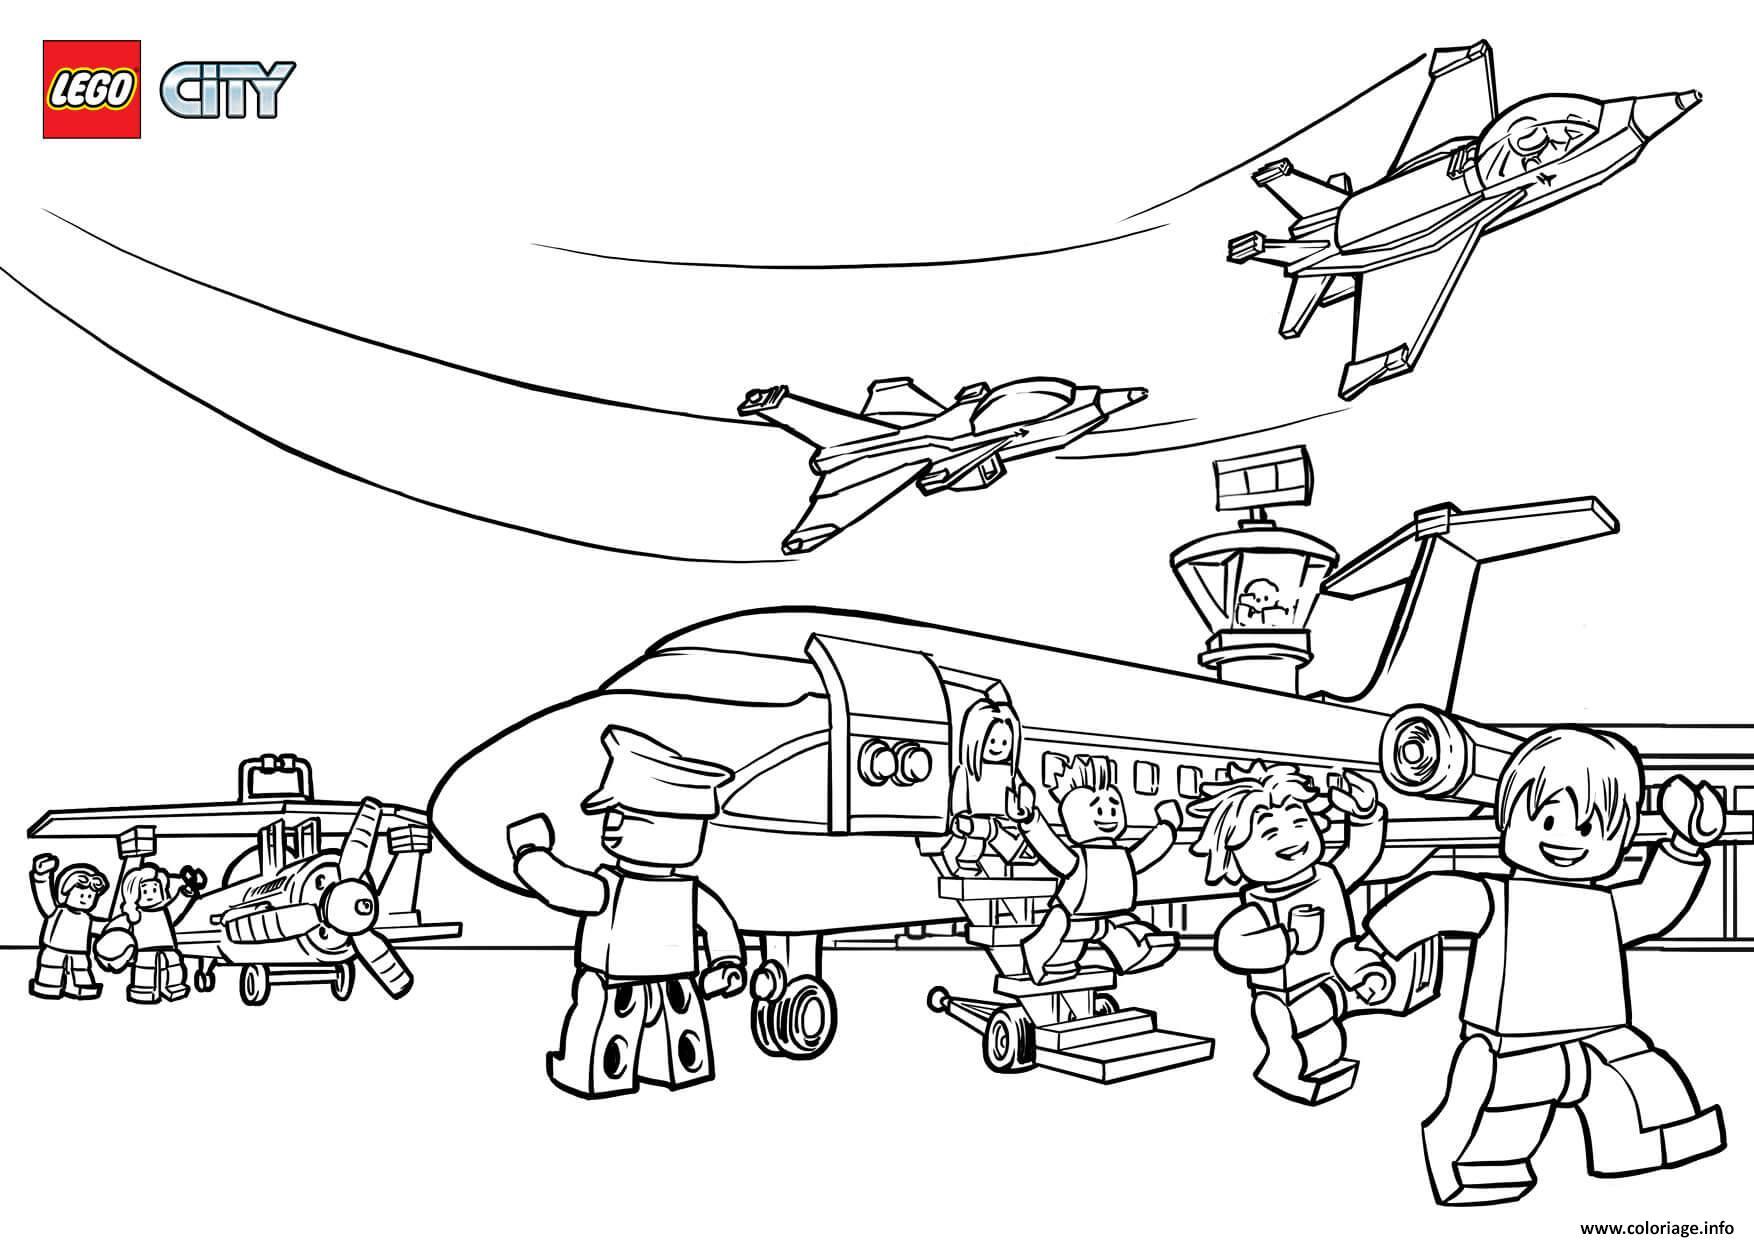 Coloriage Lego City Airport dessin